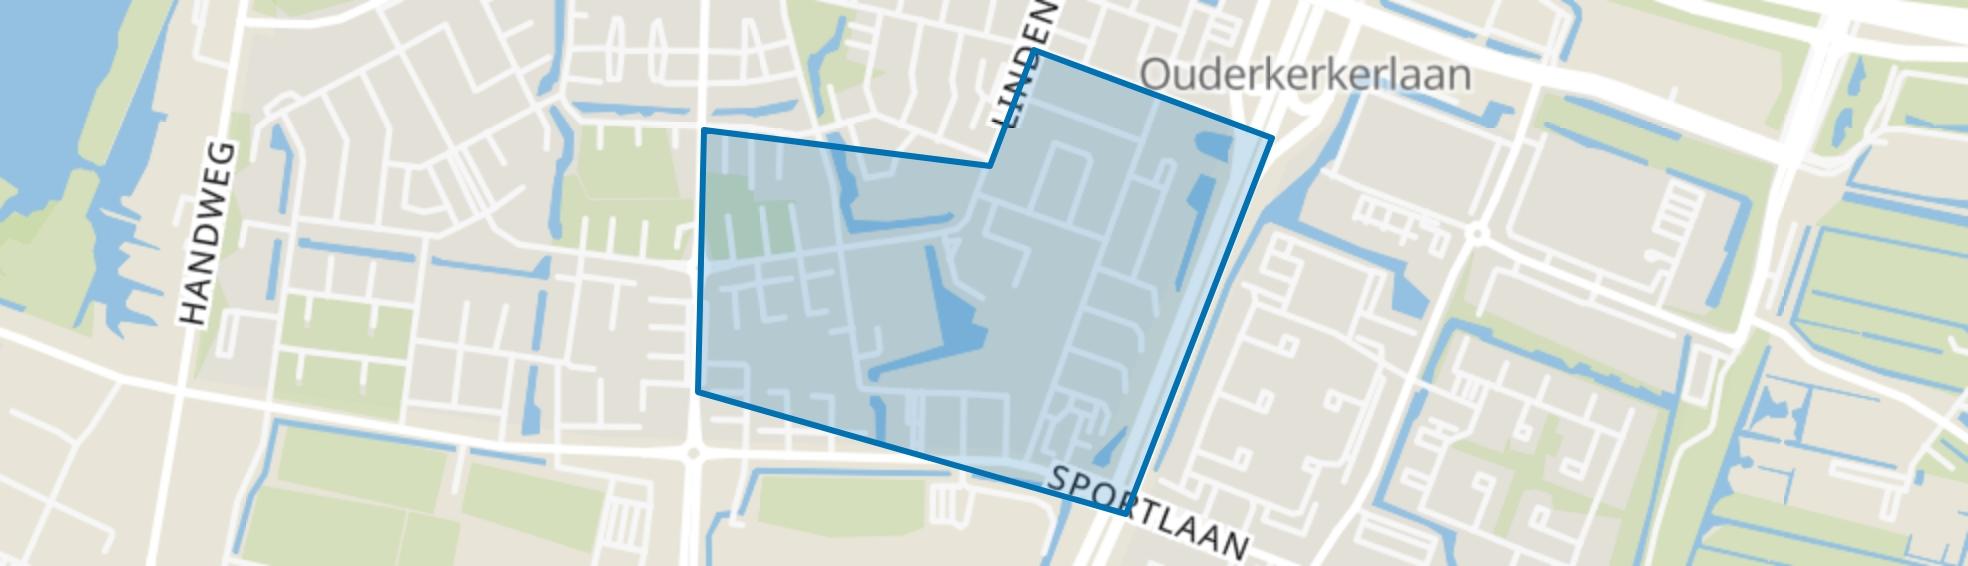 Augustinuspark, Amstelveen map